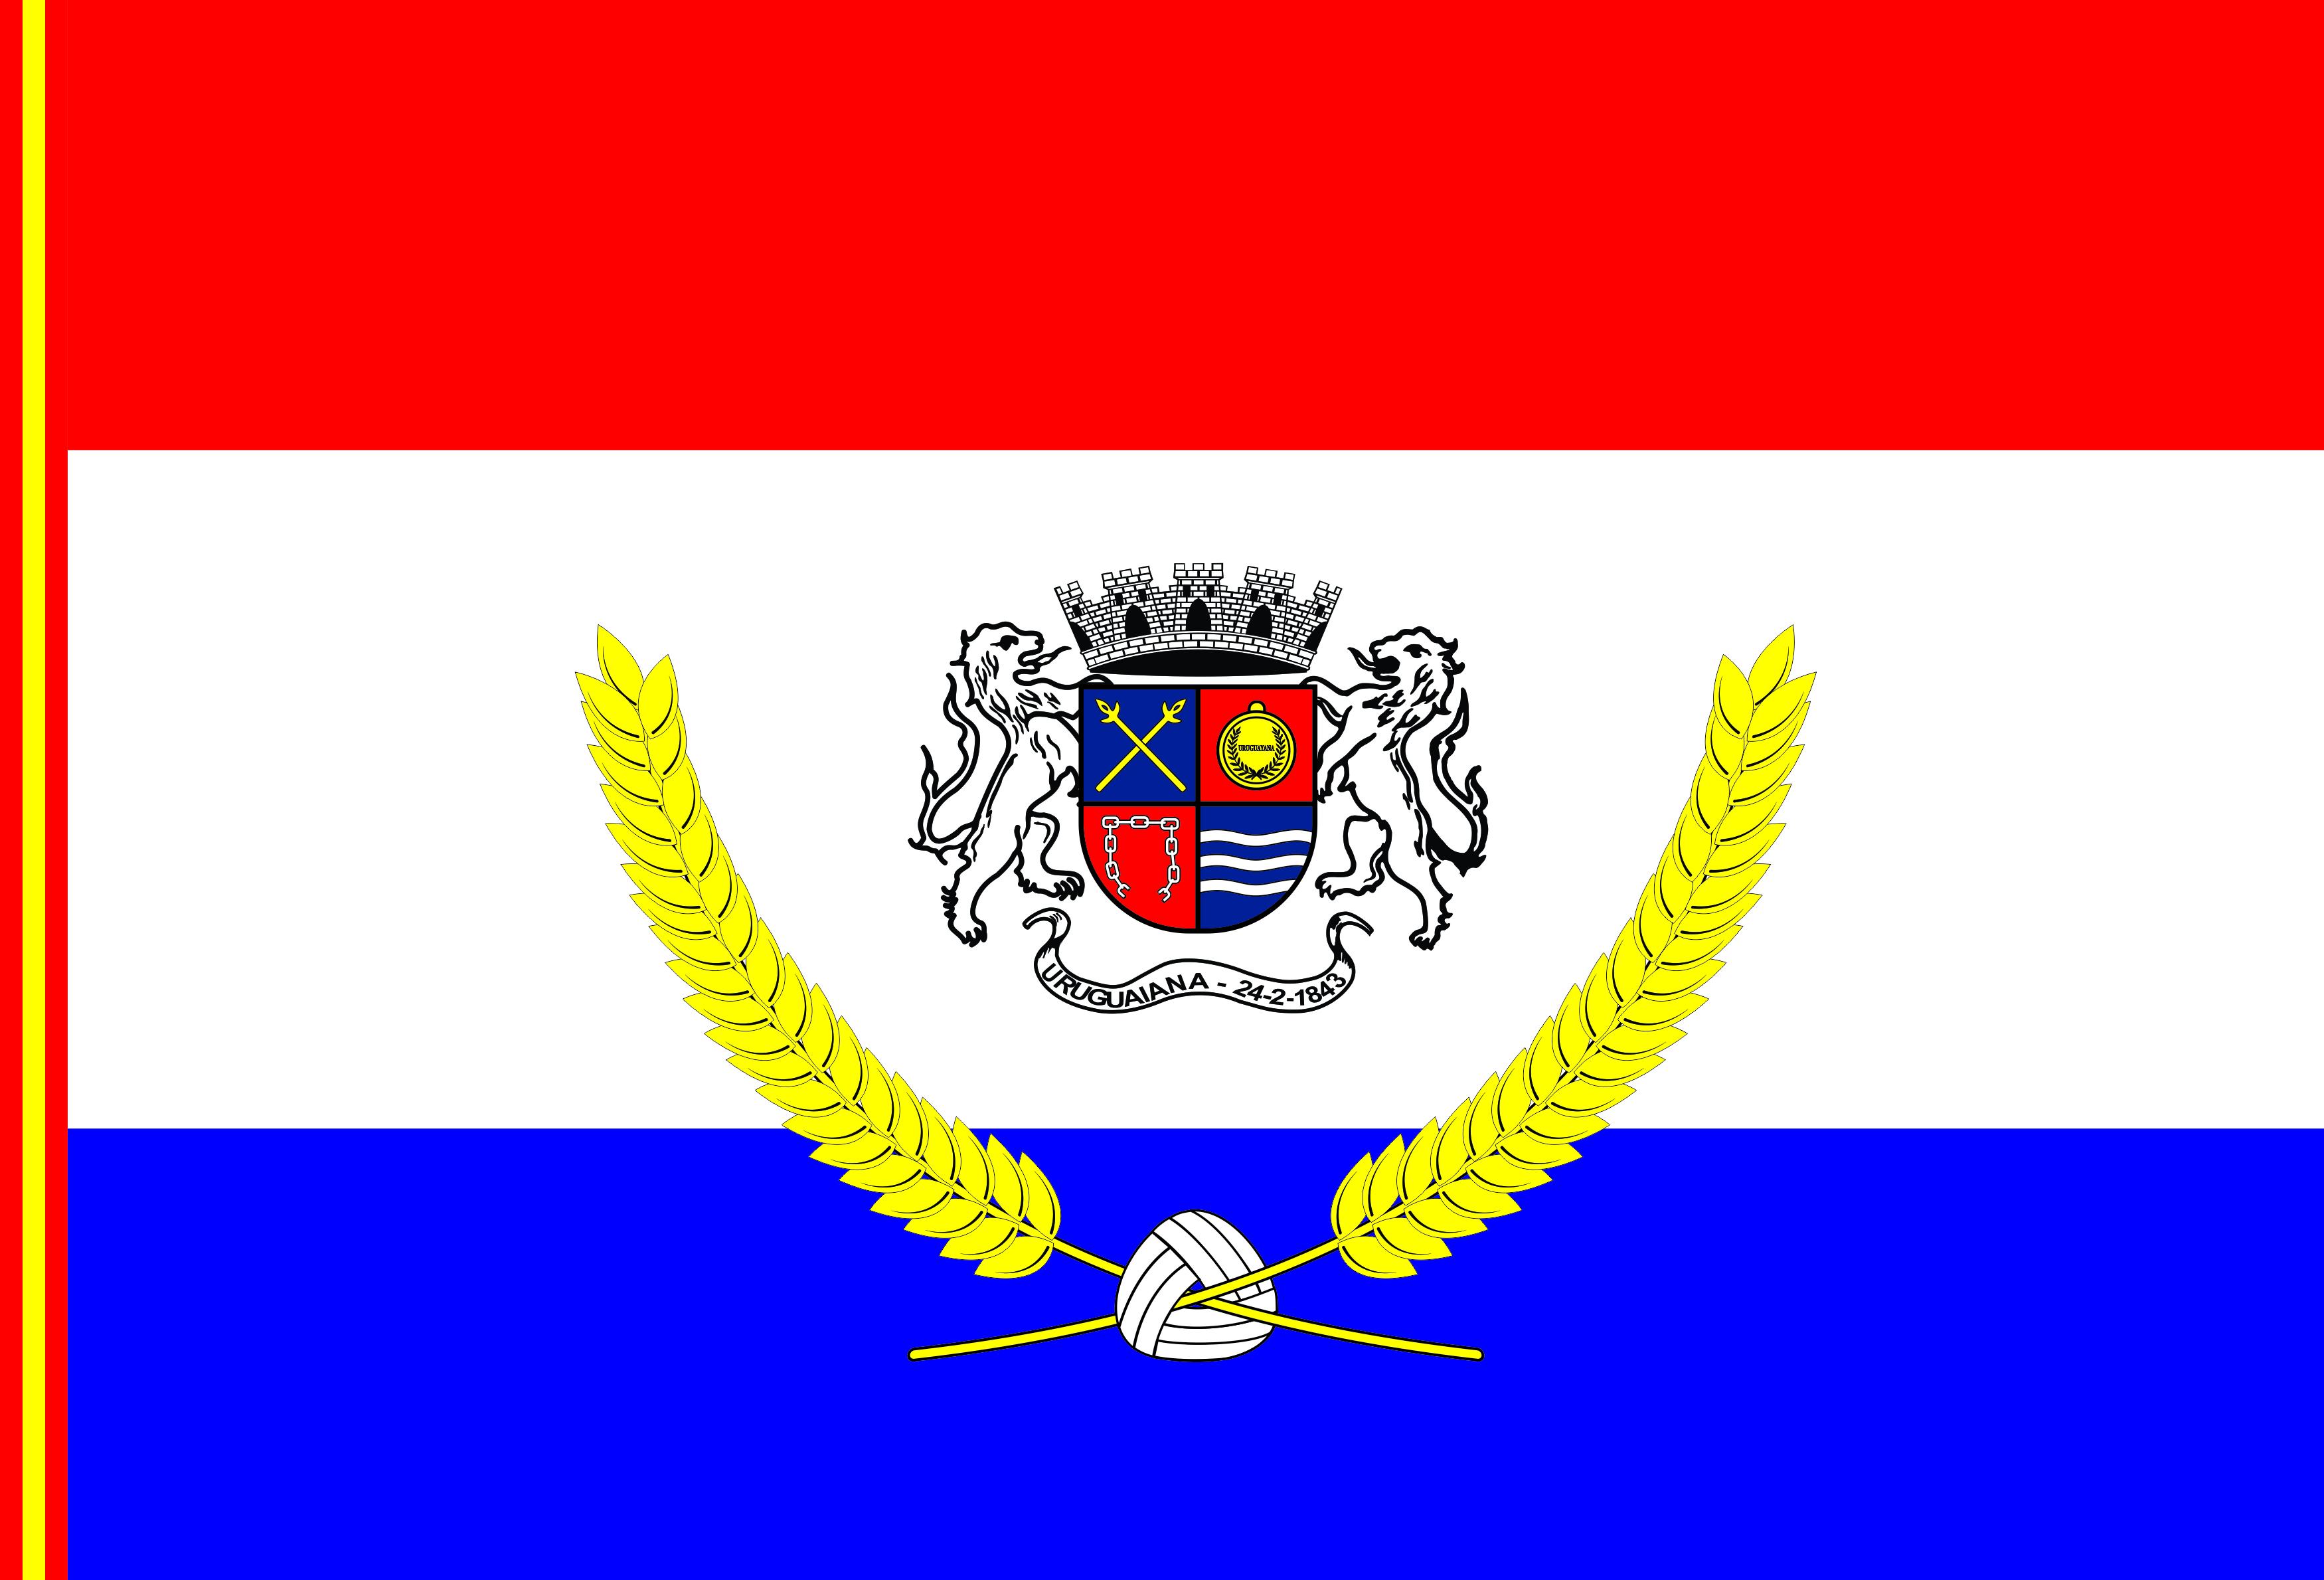 Ficheiro:Uruguaiana-bandeira.jpg